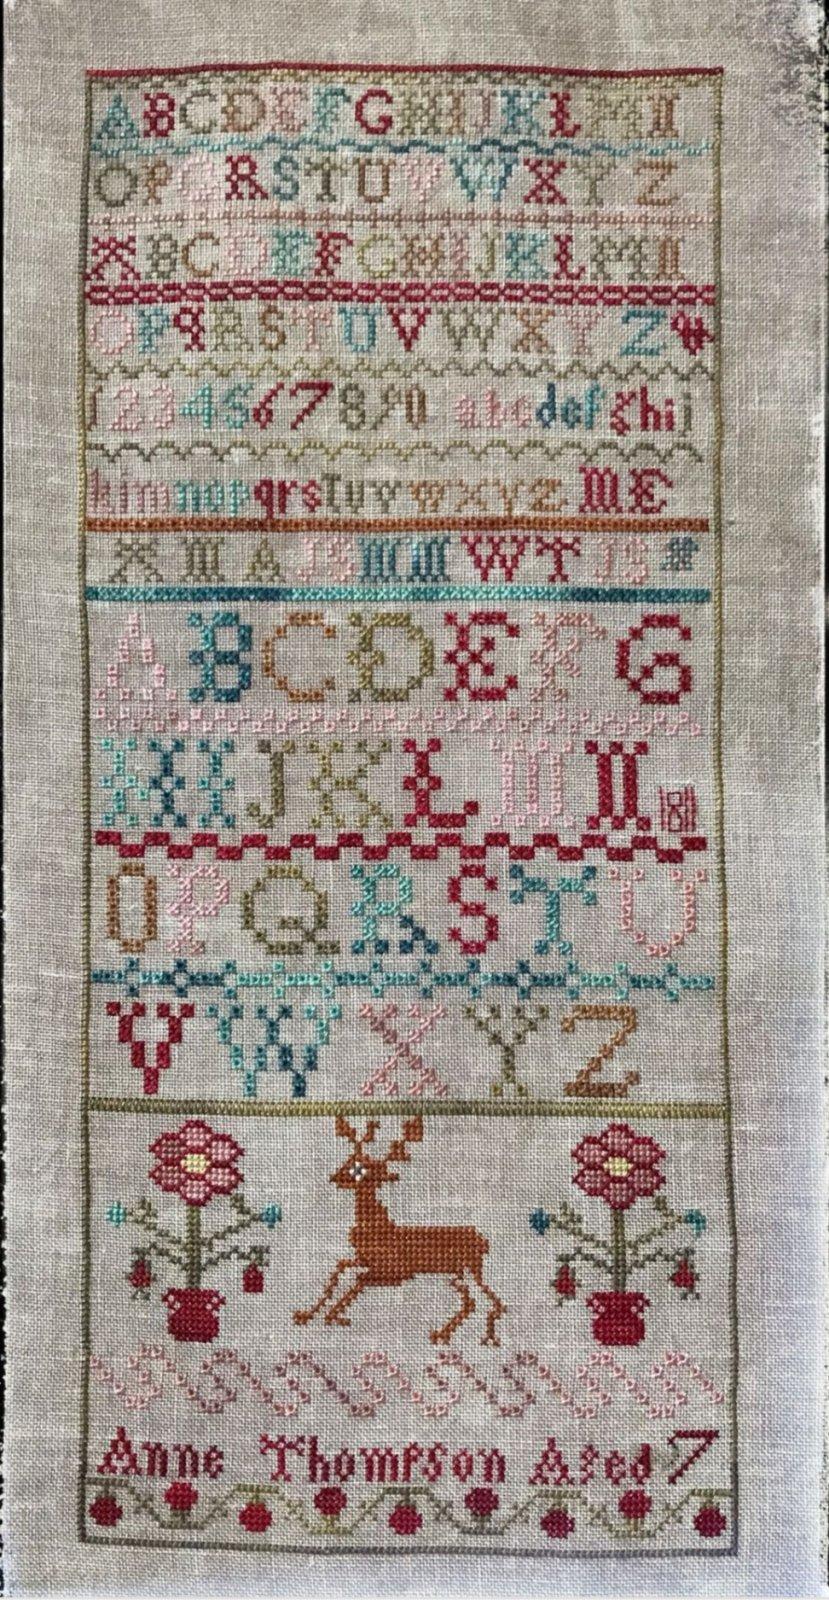 Lucy Beam - Anne Thompson 1811